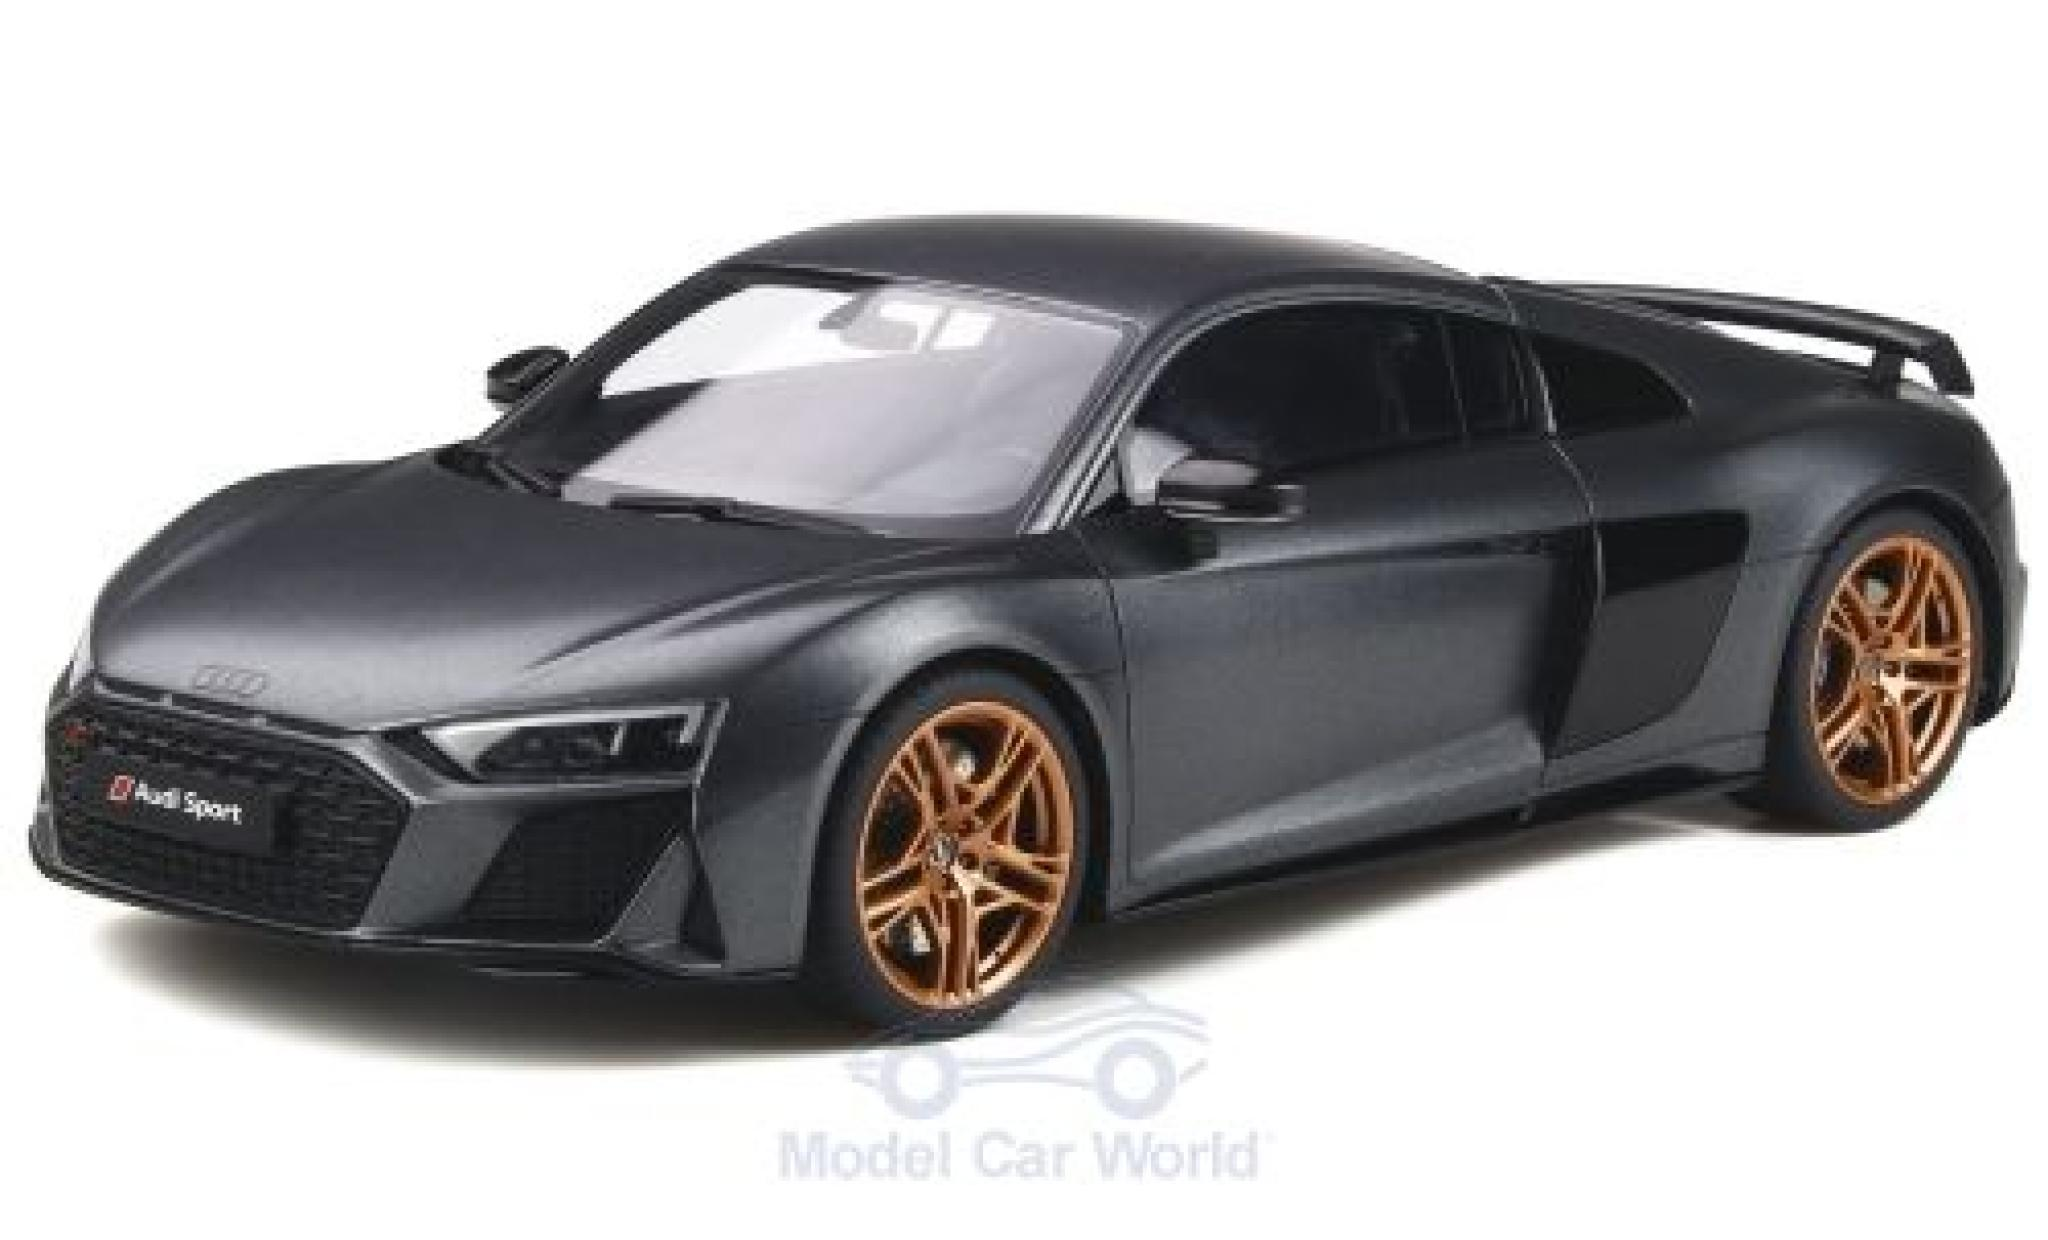 Audi R8 1/18 GT Spirit Decennium matt-grise 2018